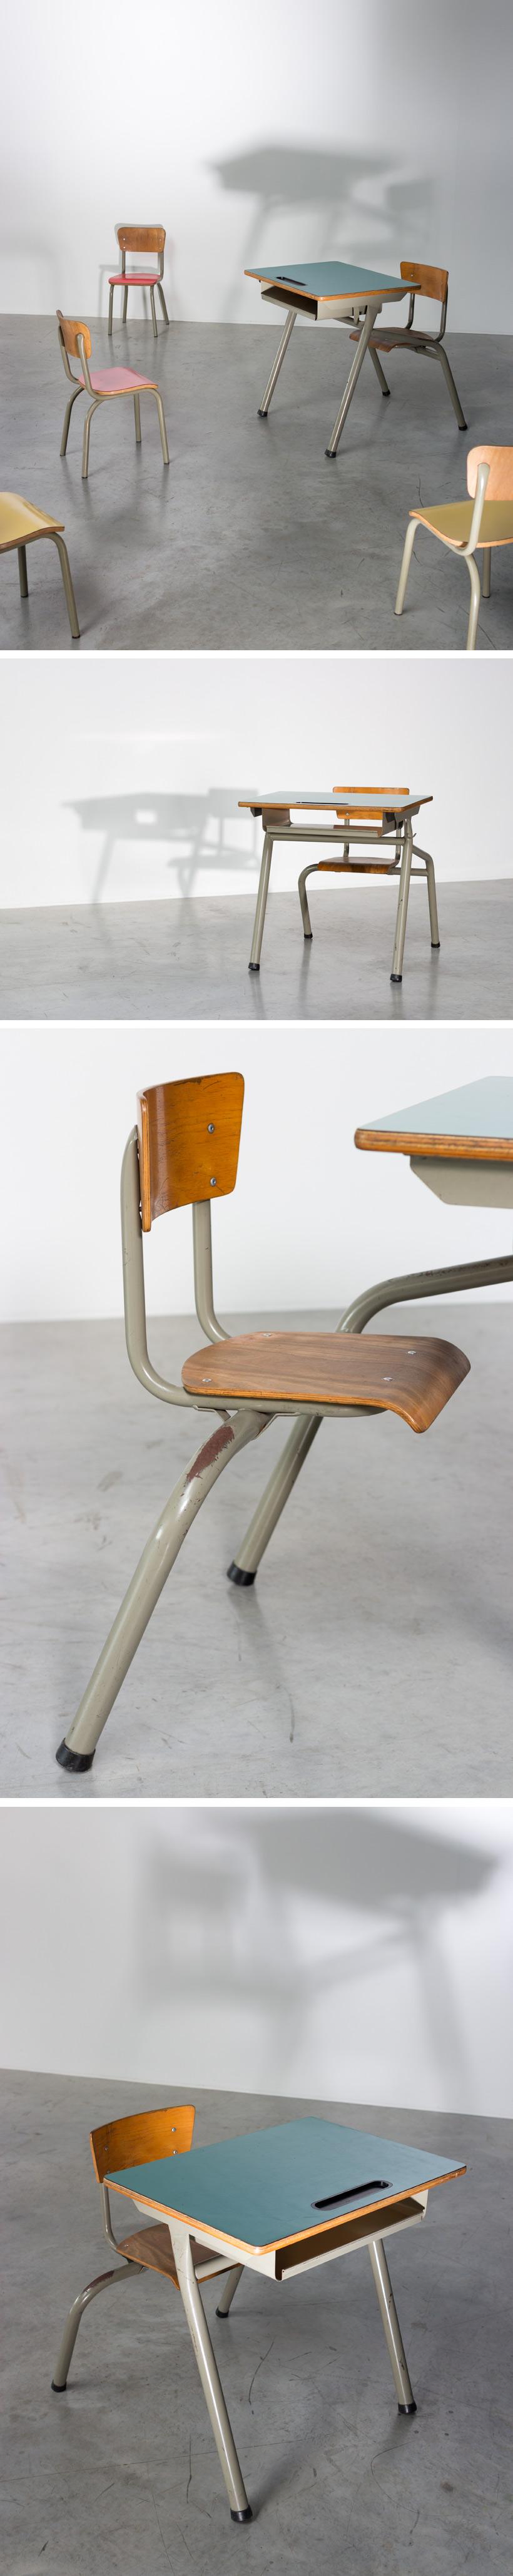 Tubax industrial school desk for children Large